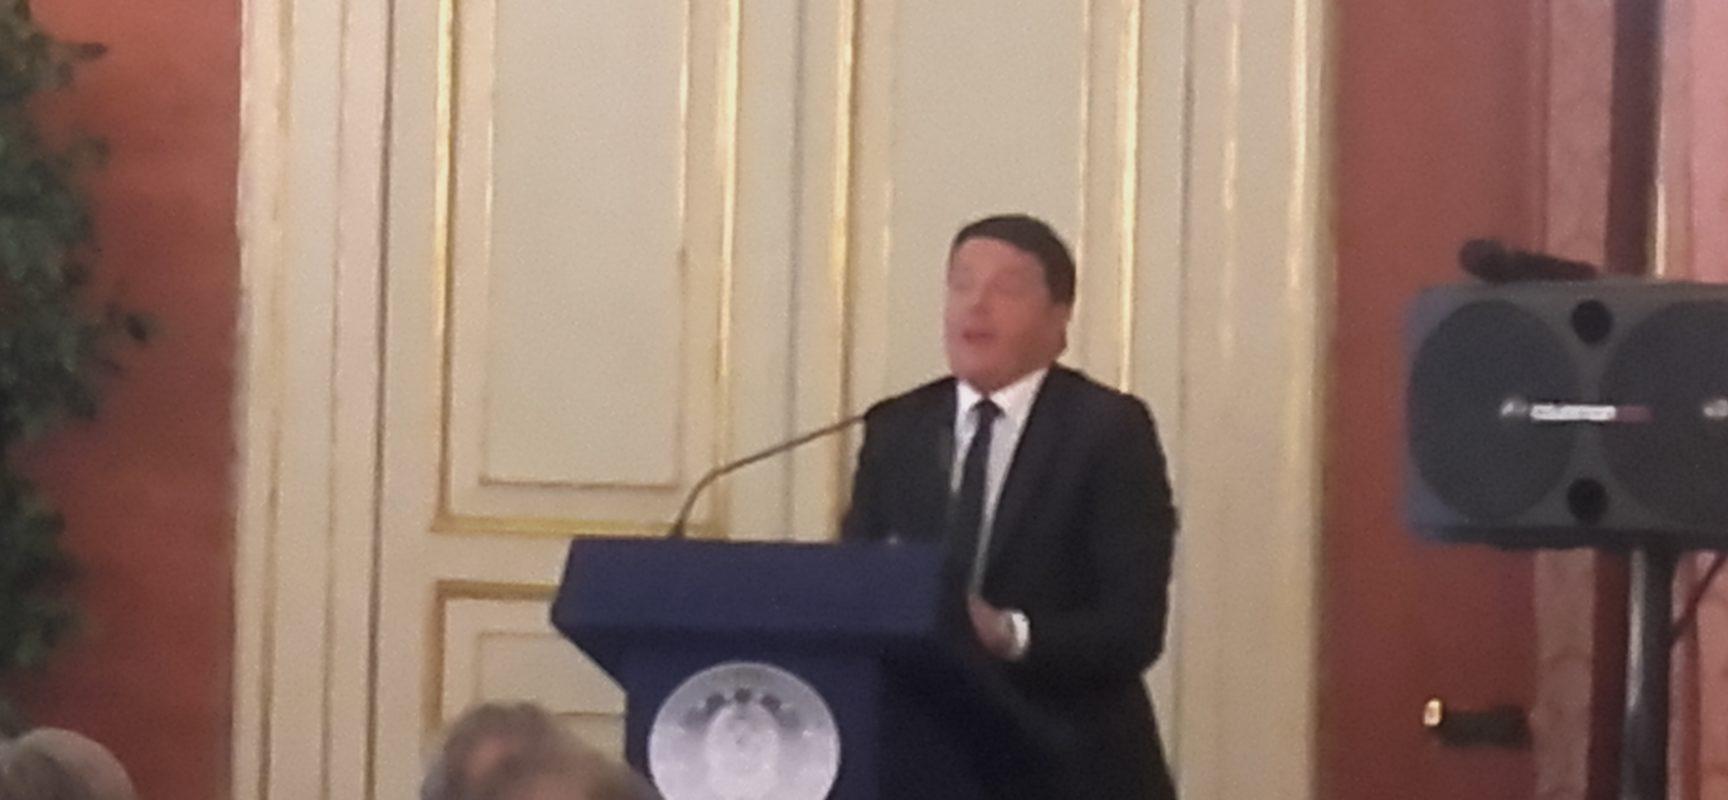 Matteo Renzi a Napoli in ritardo